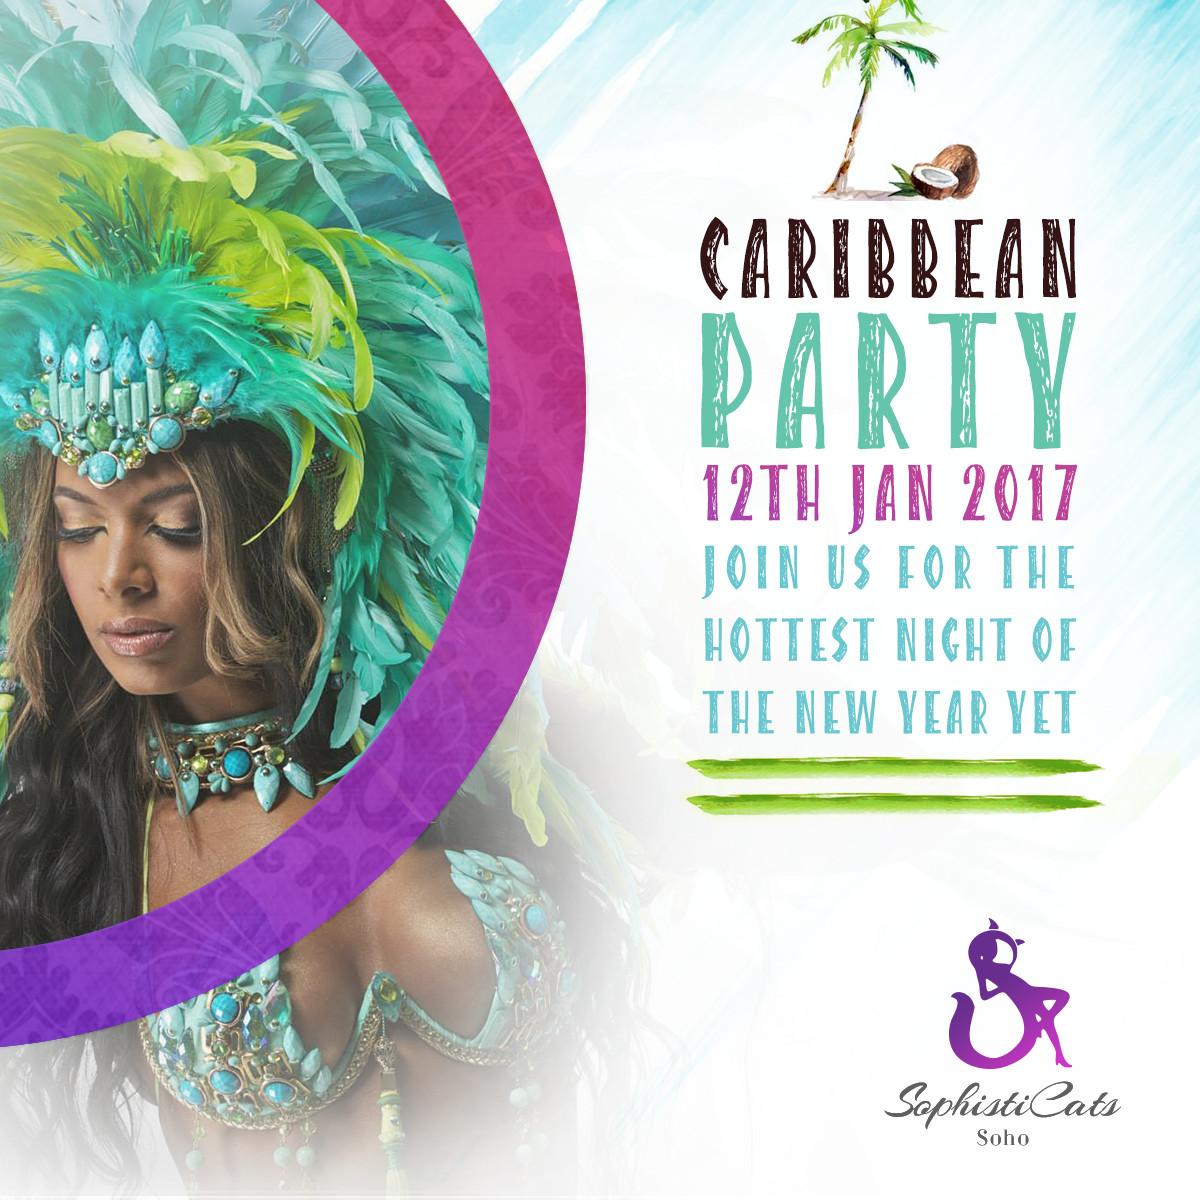 Caribbean Party at Sophisticats Strip club London